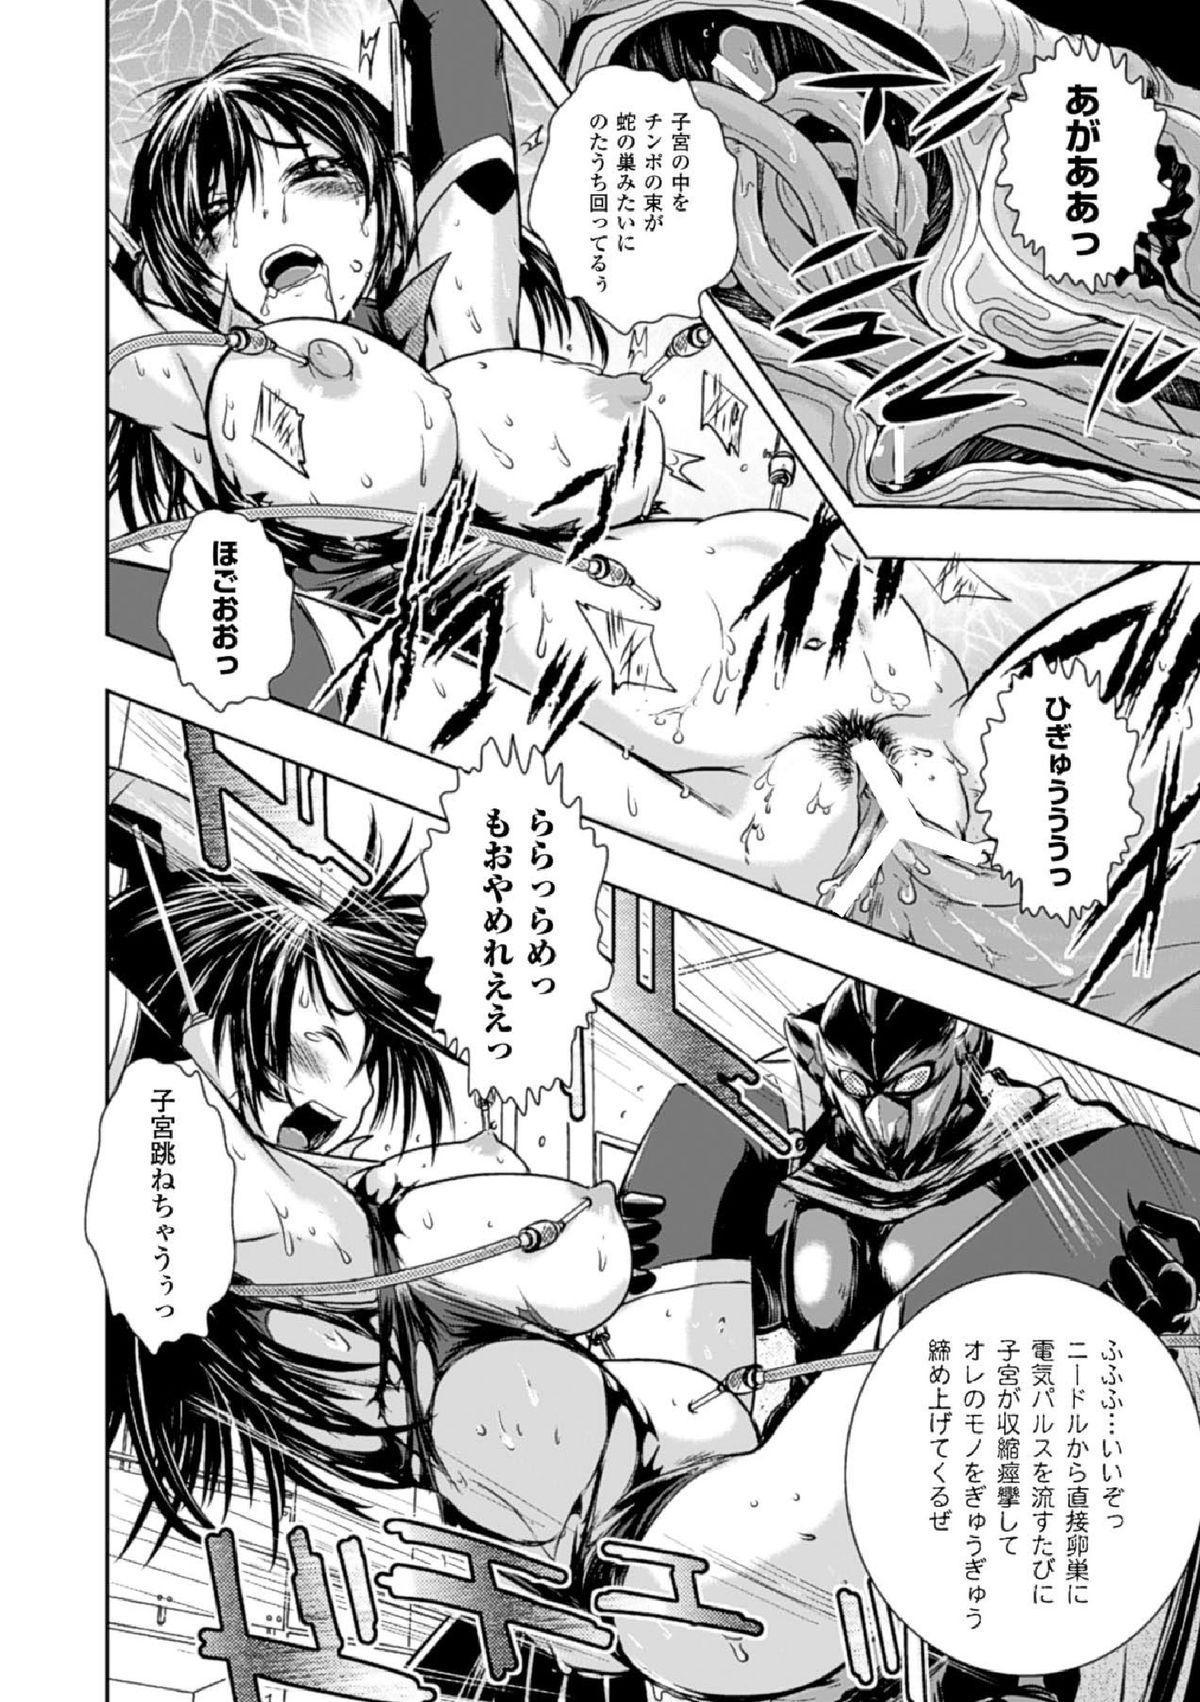 Haiboku Heroine Kaizou Choukyou Inferno 17